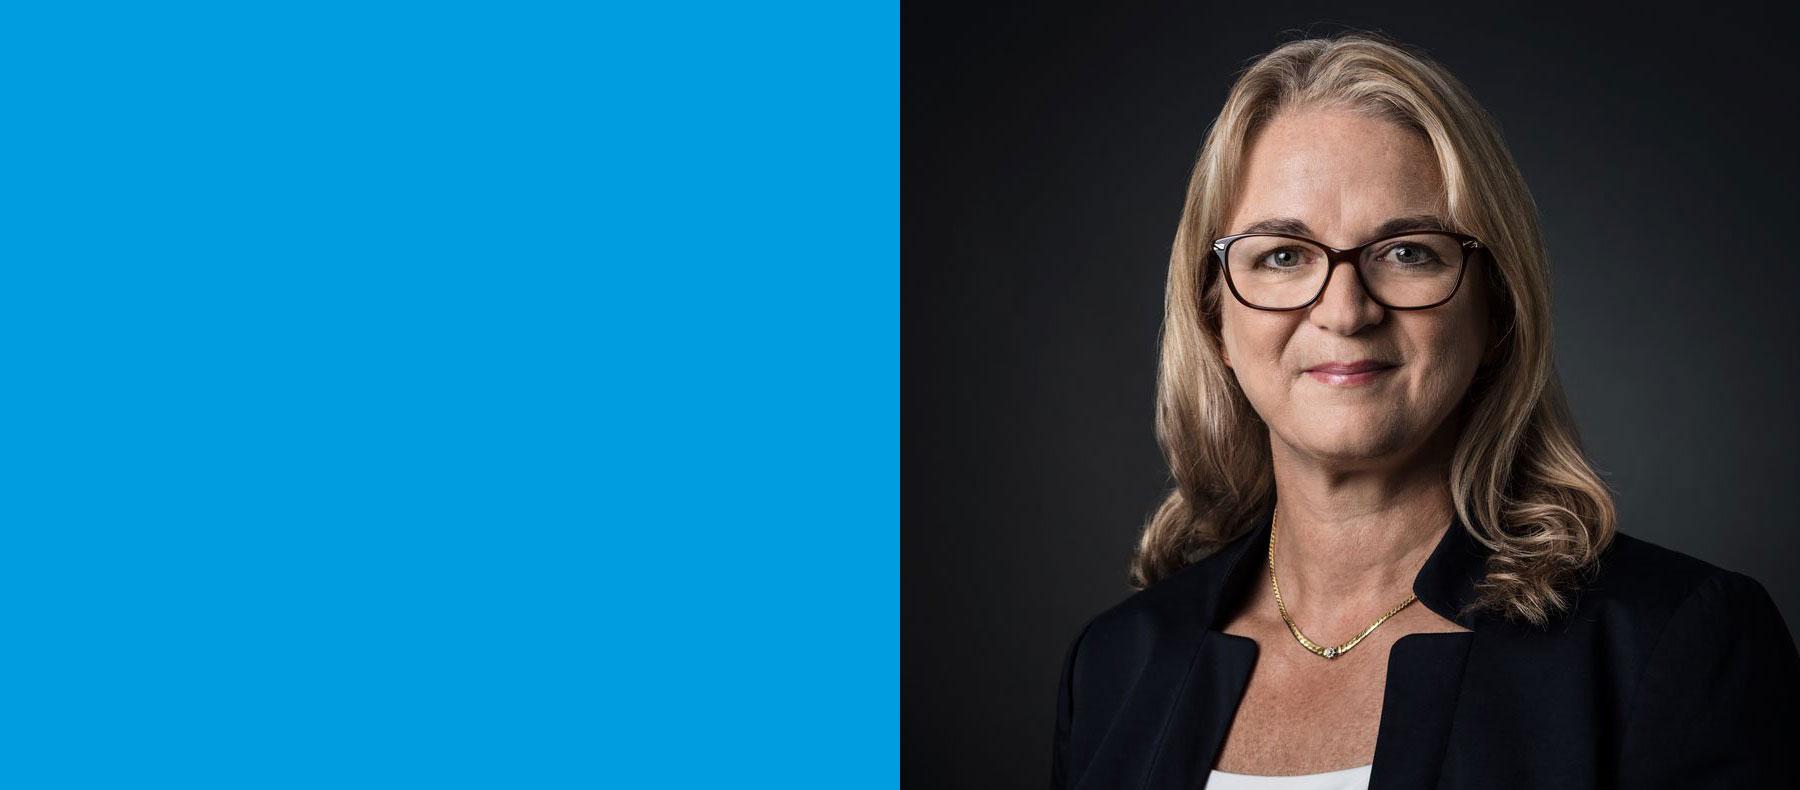 Rechtsanwältin Nürnberg Header Kerstin Gieseler